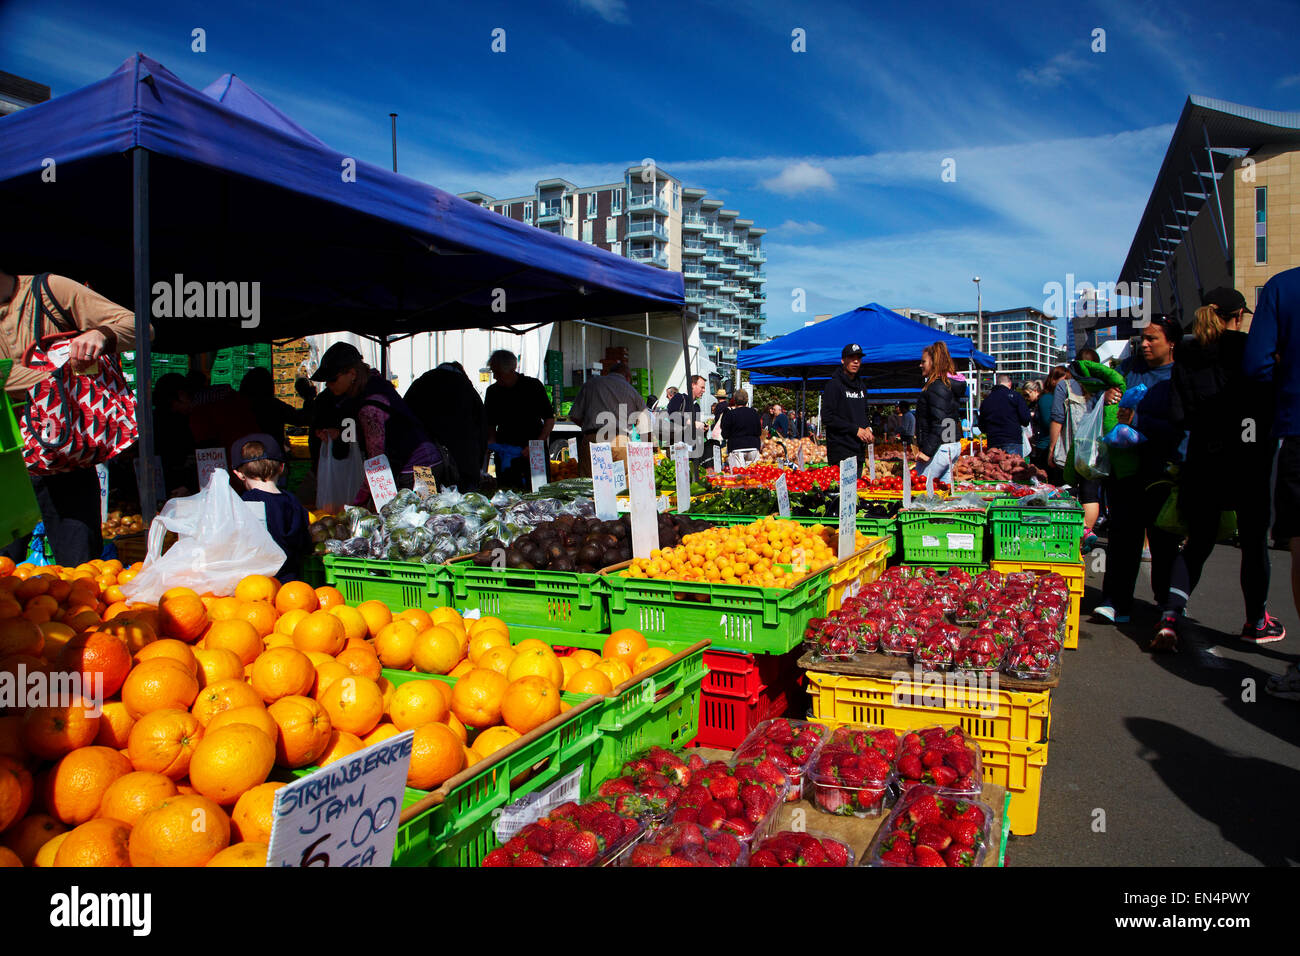 Fruit and vegetables at Harbourside Market, Wellington, North Island, New Zealand - Stock Image